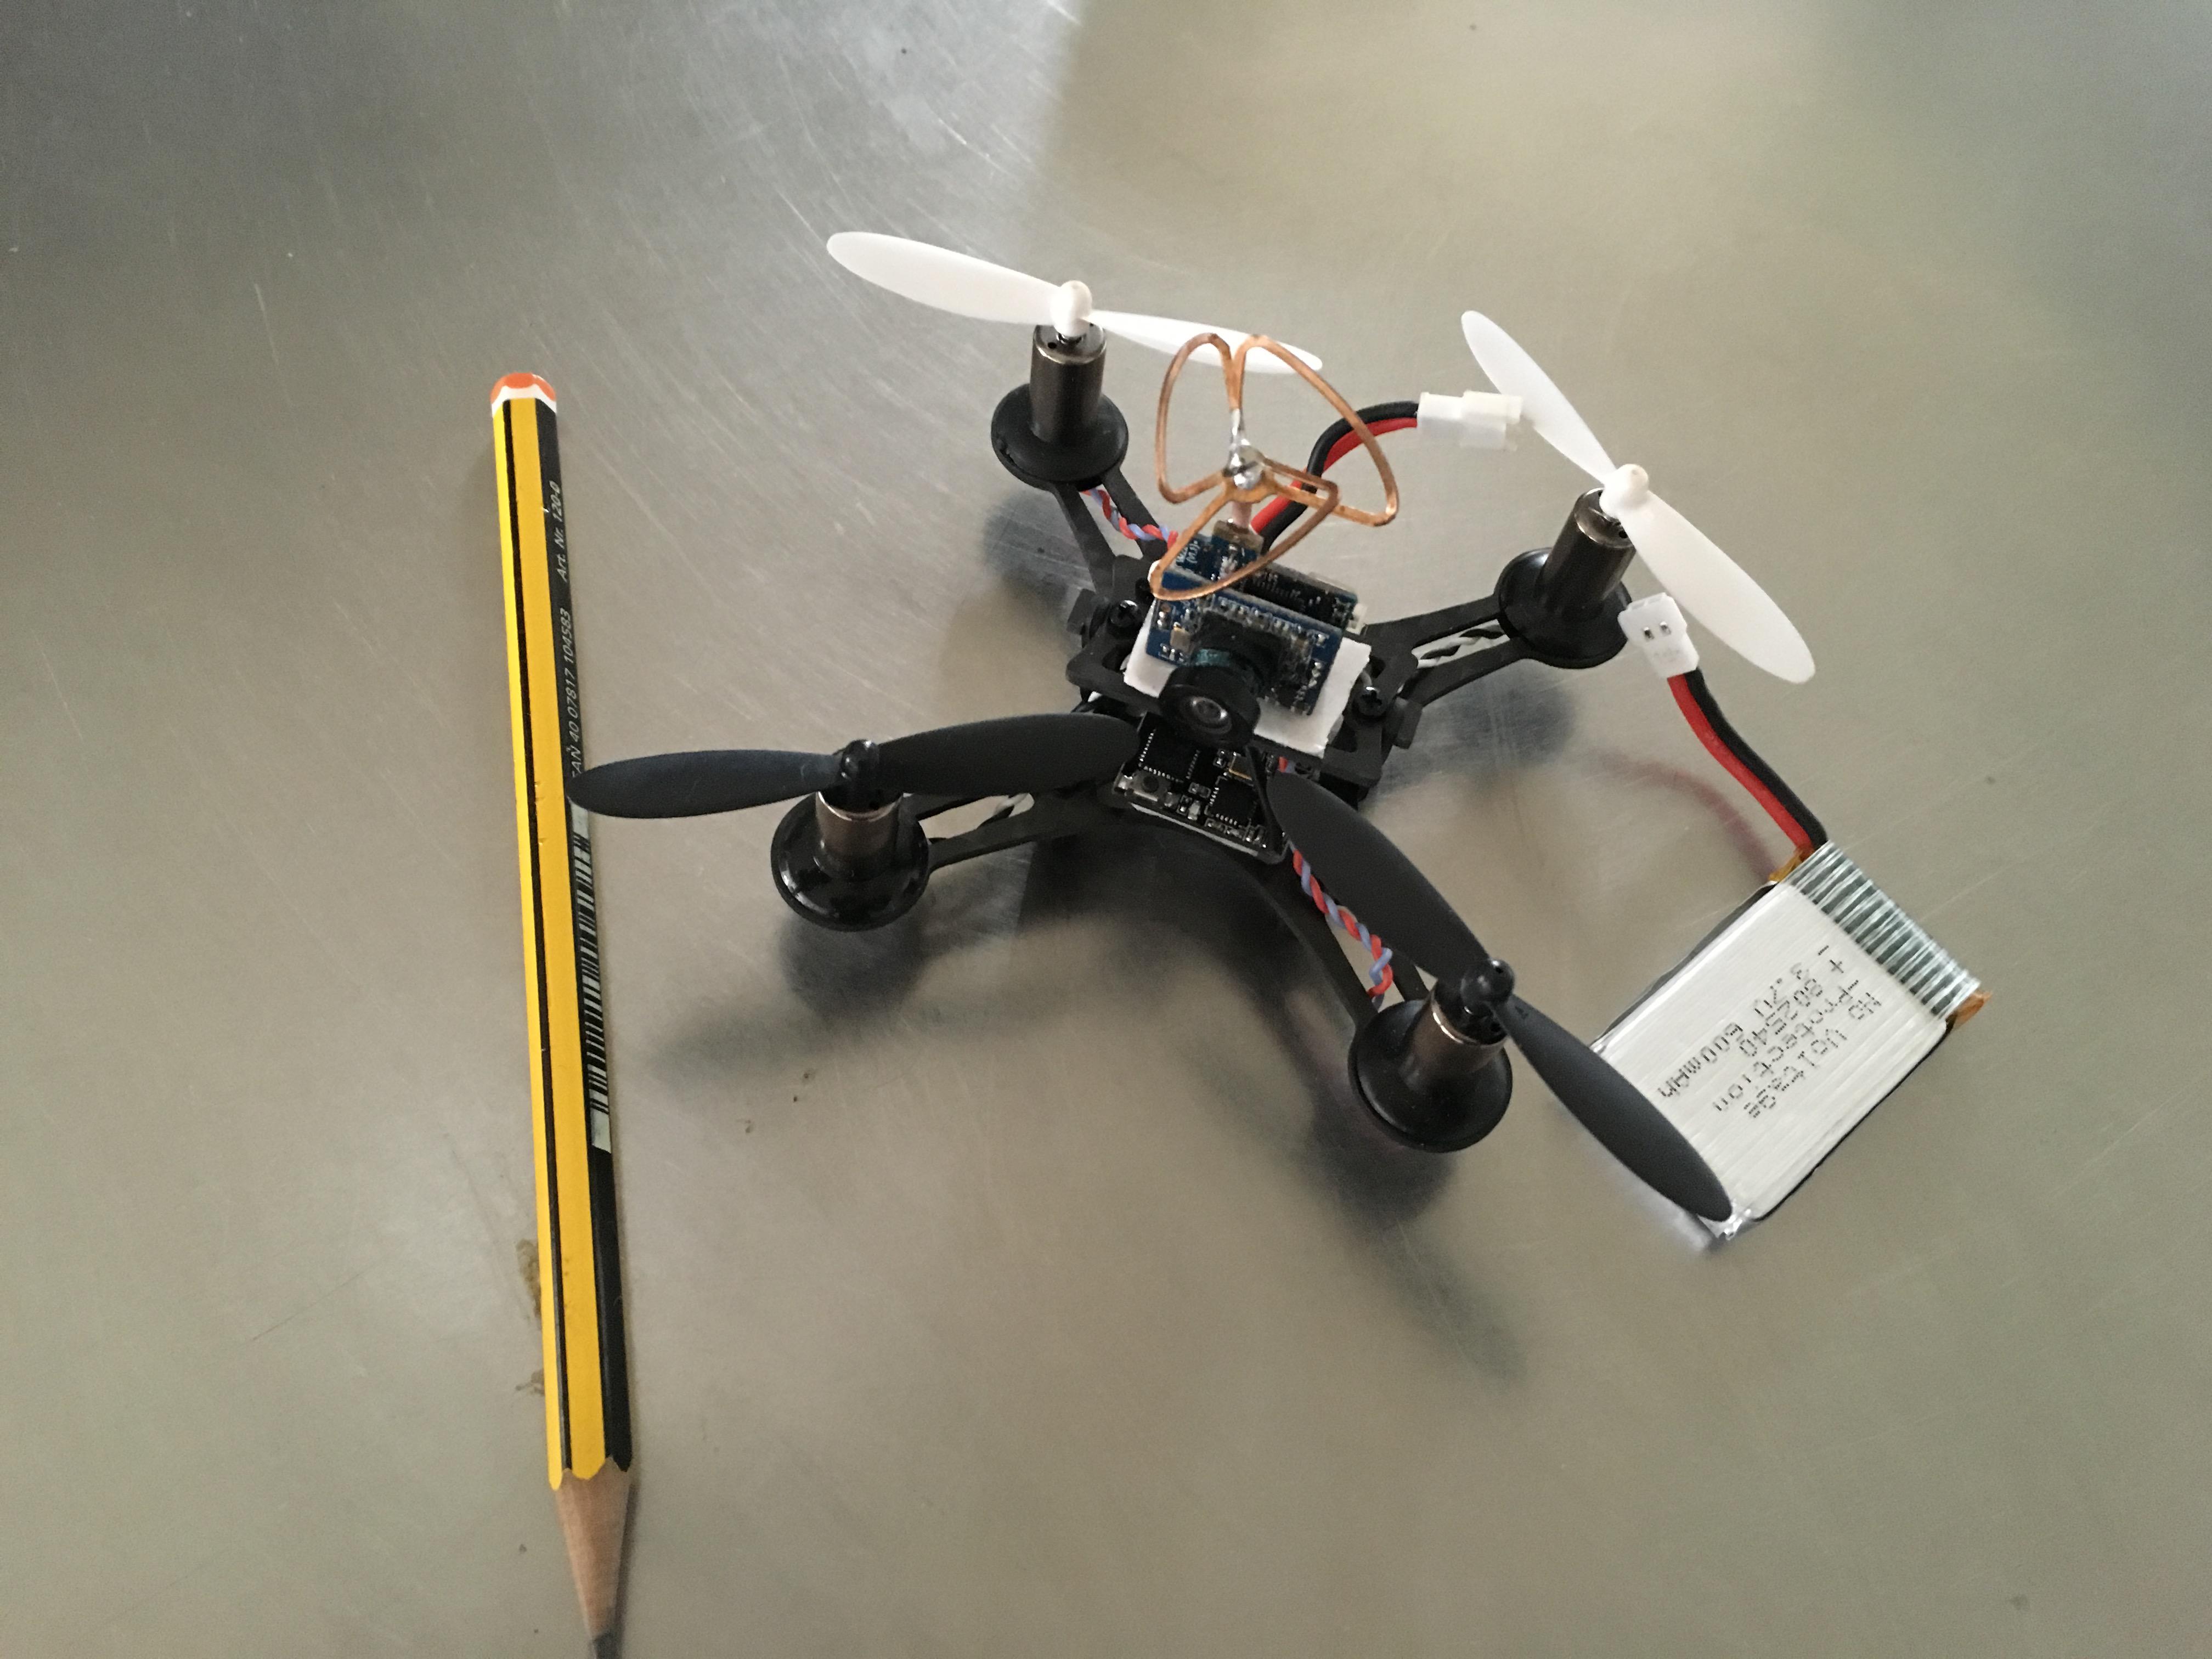 Microdron Eachine